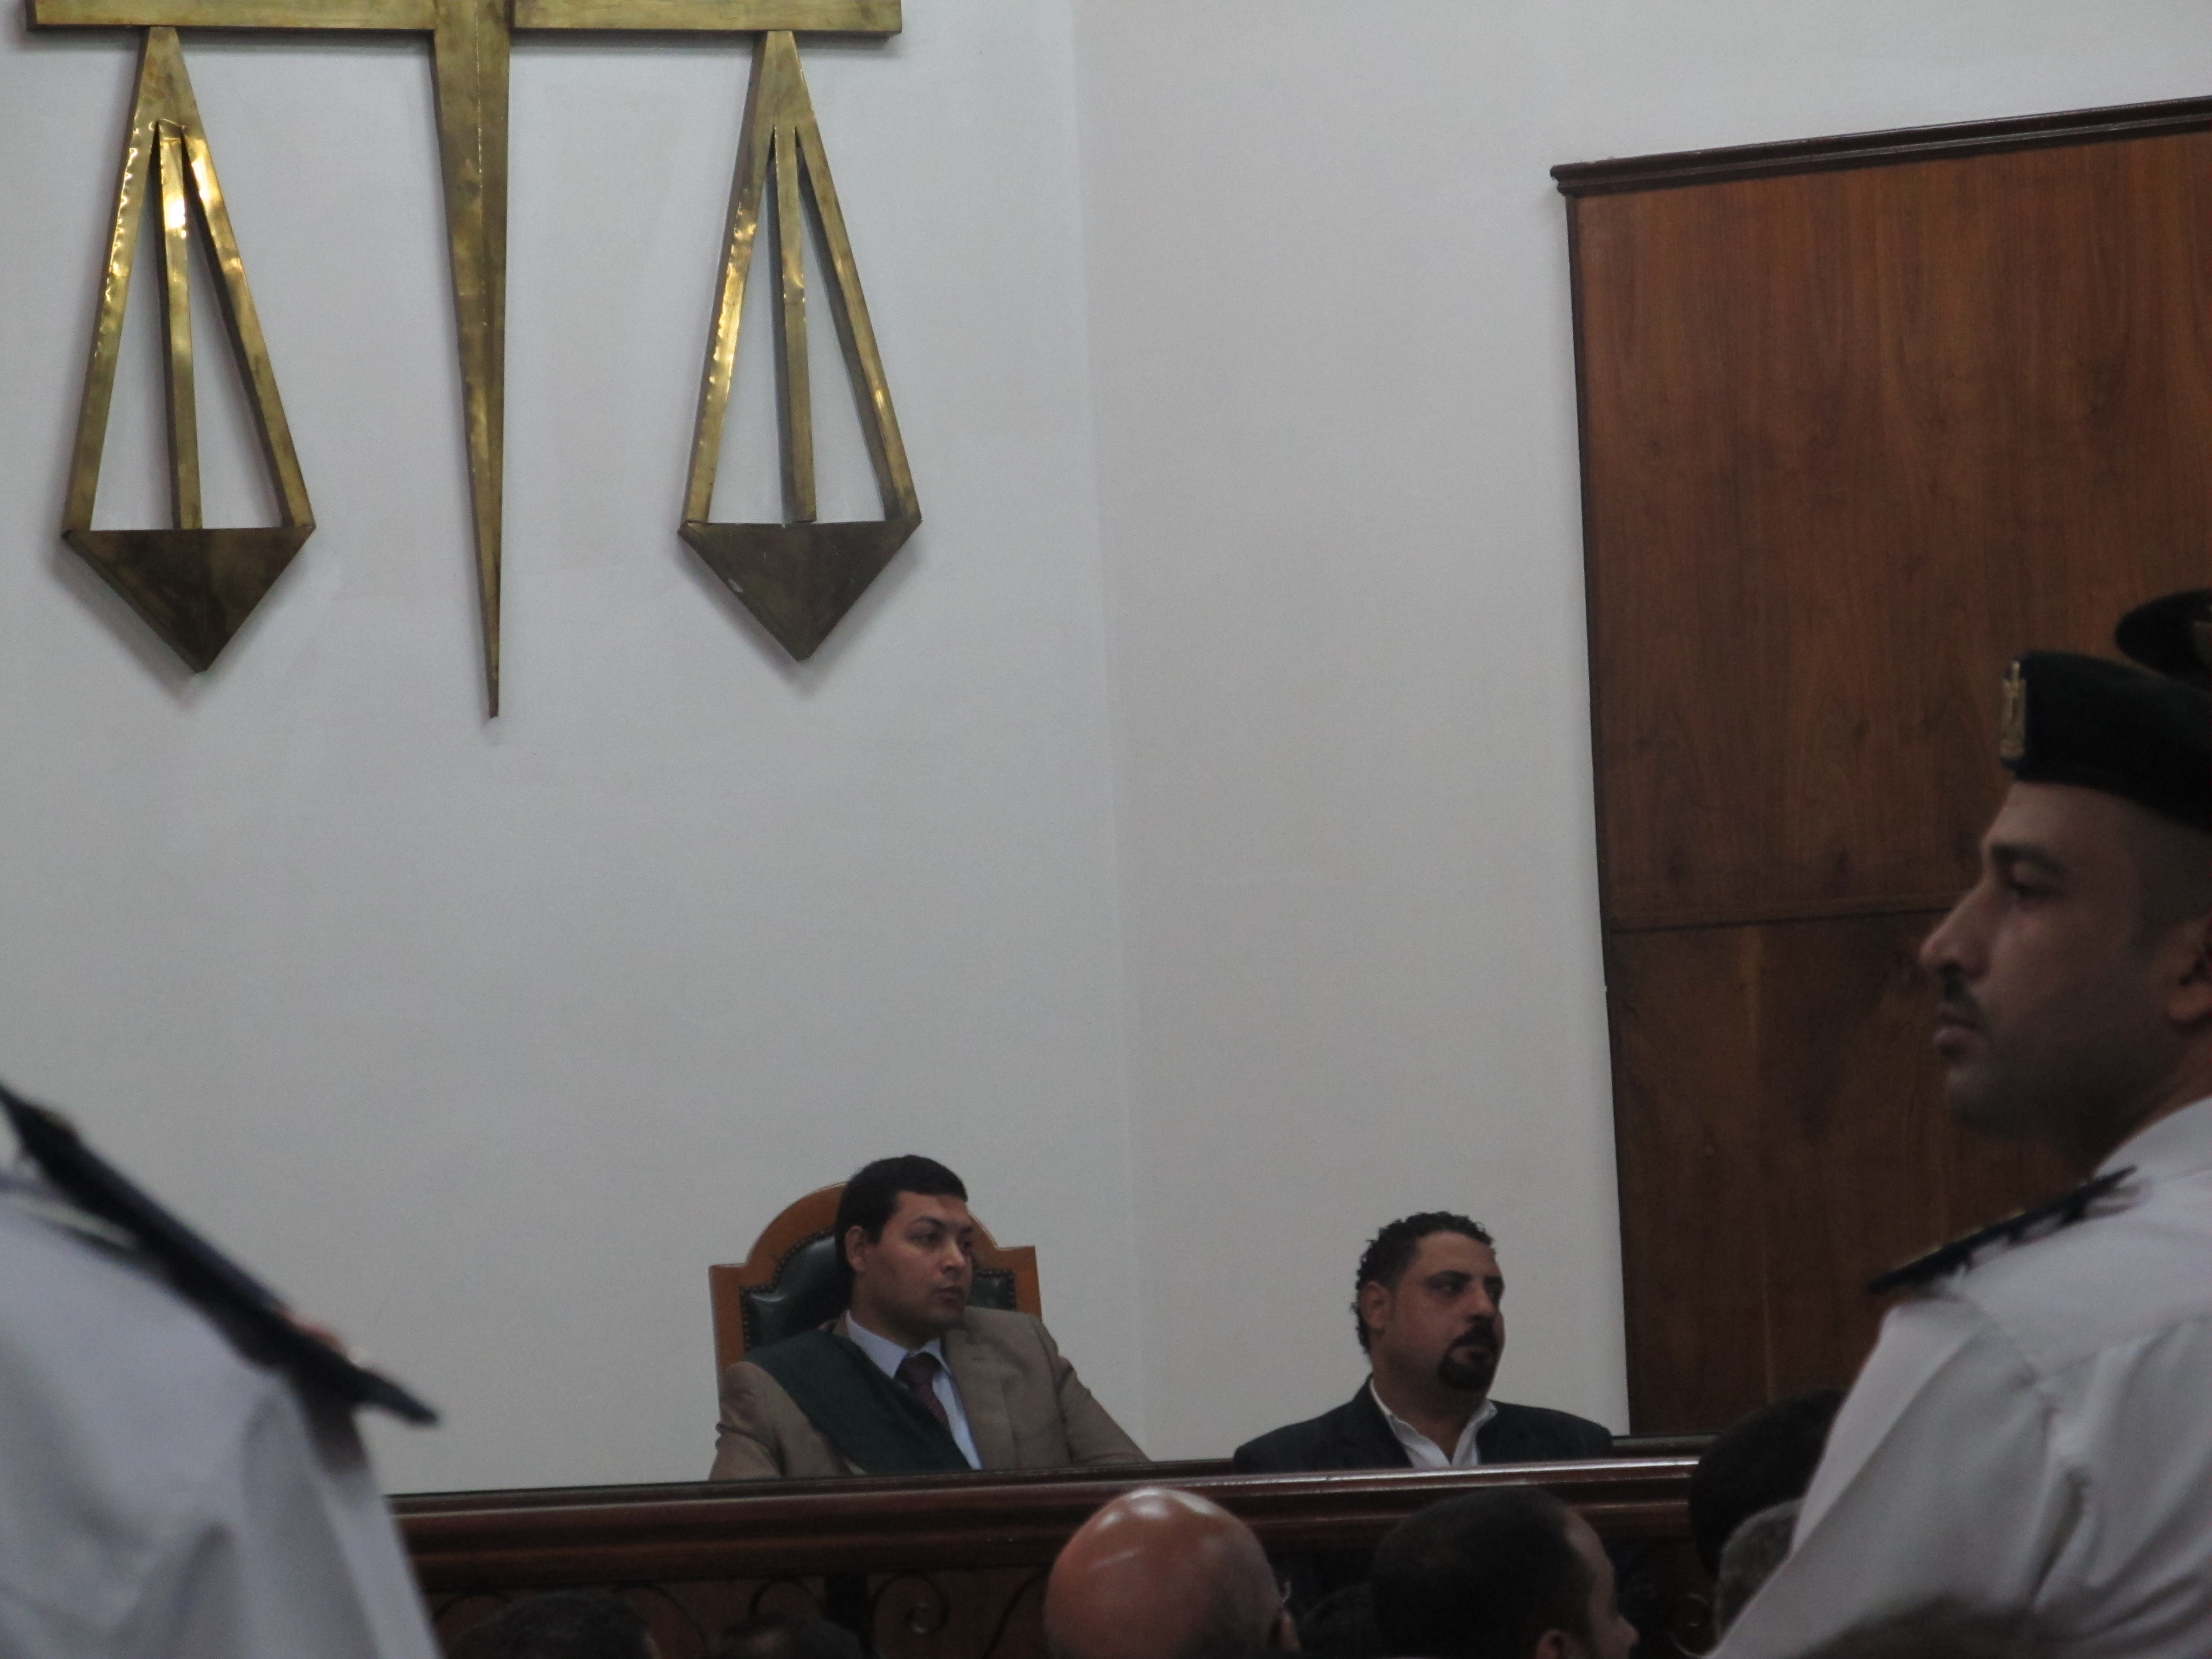 The Nile University case postponed until 11 November (Photo by Rana Muhammad Taha)